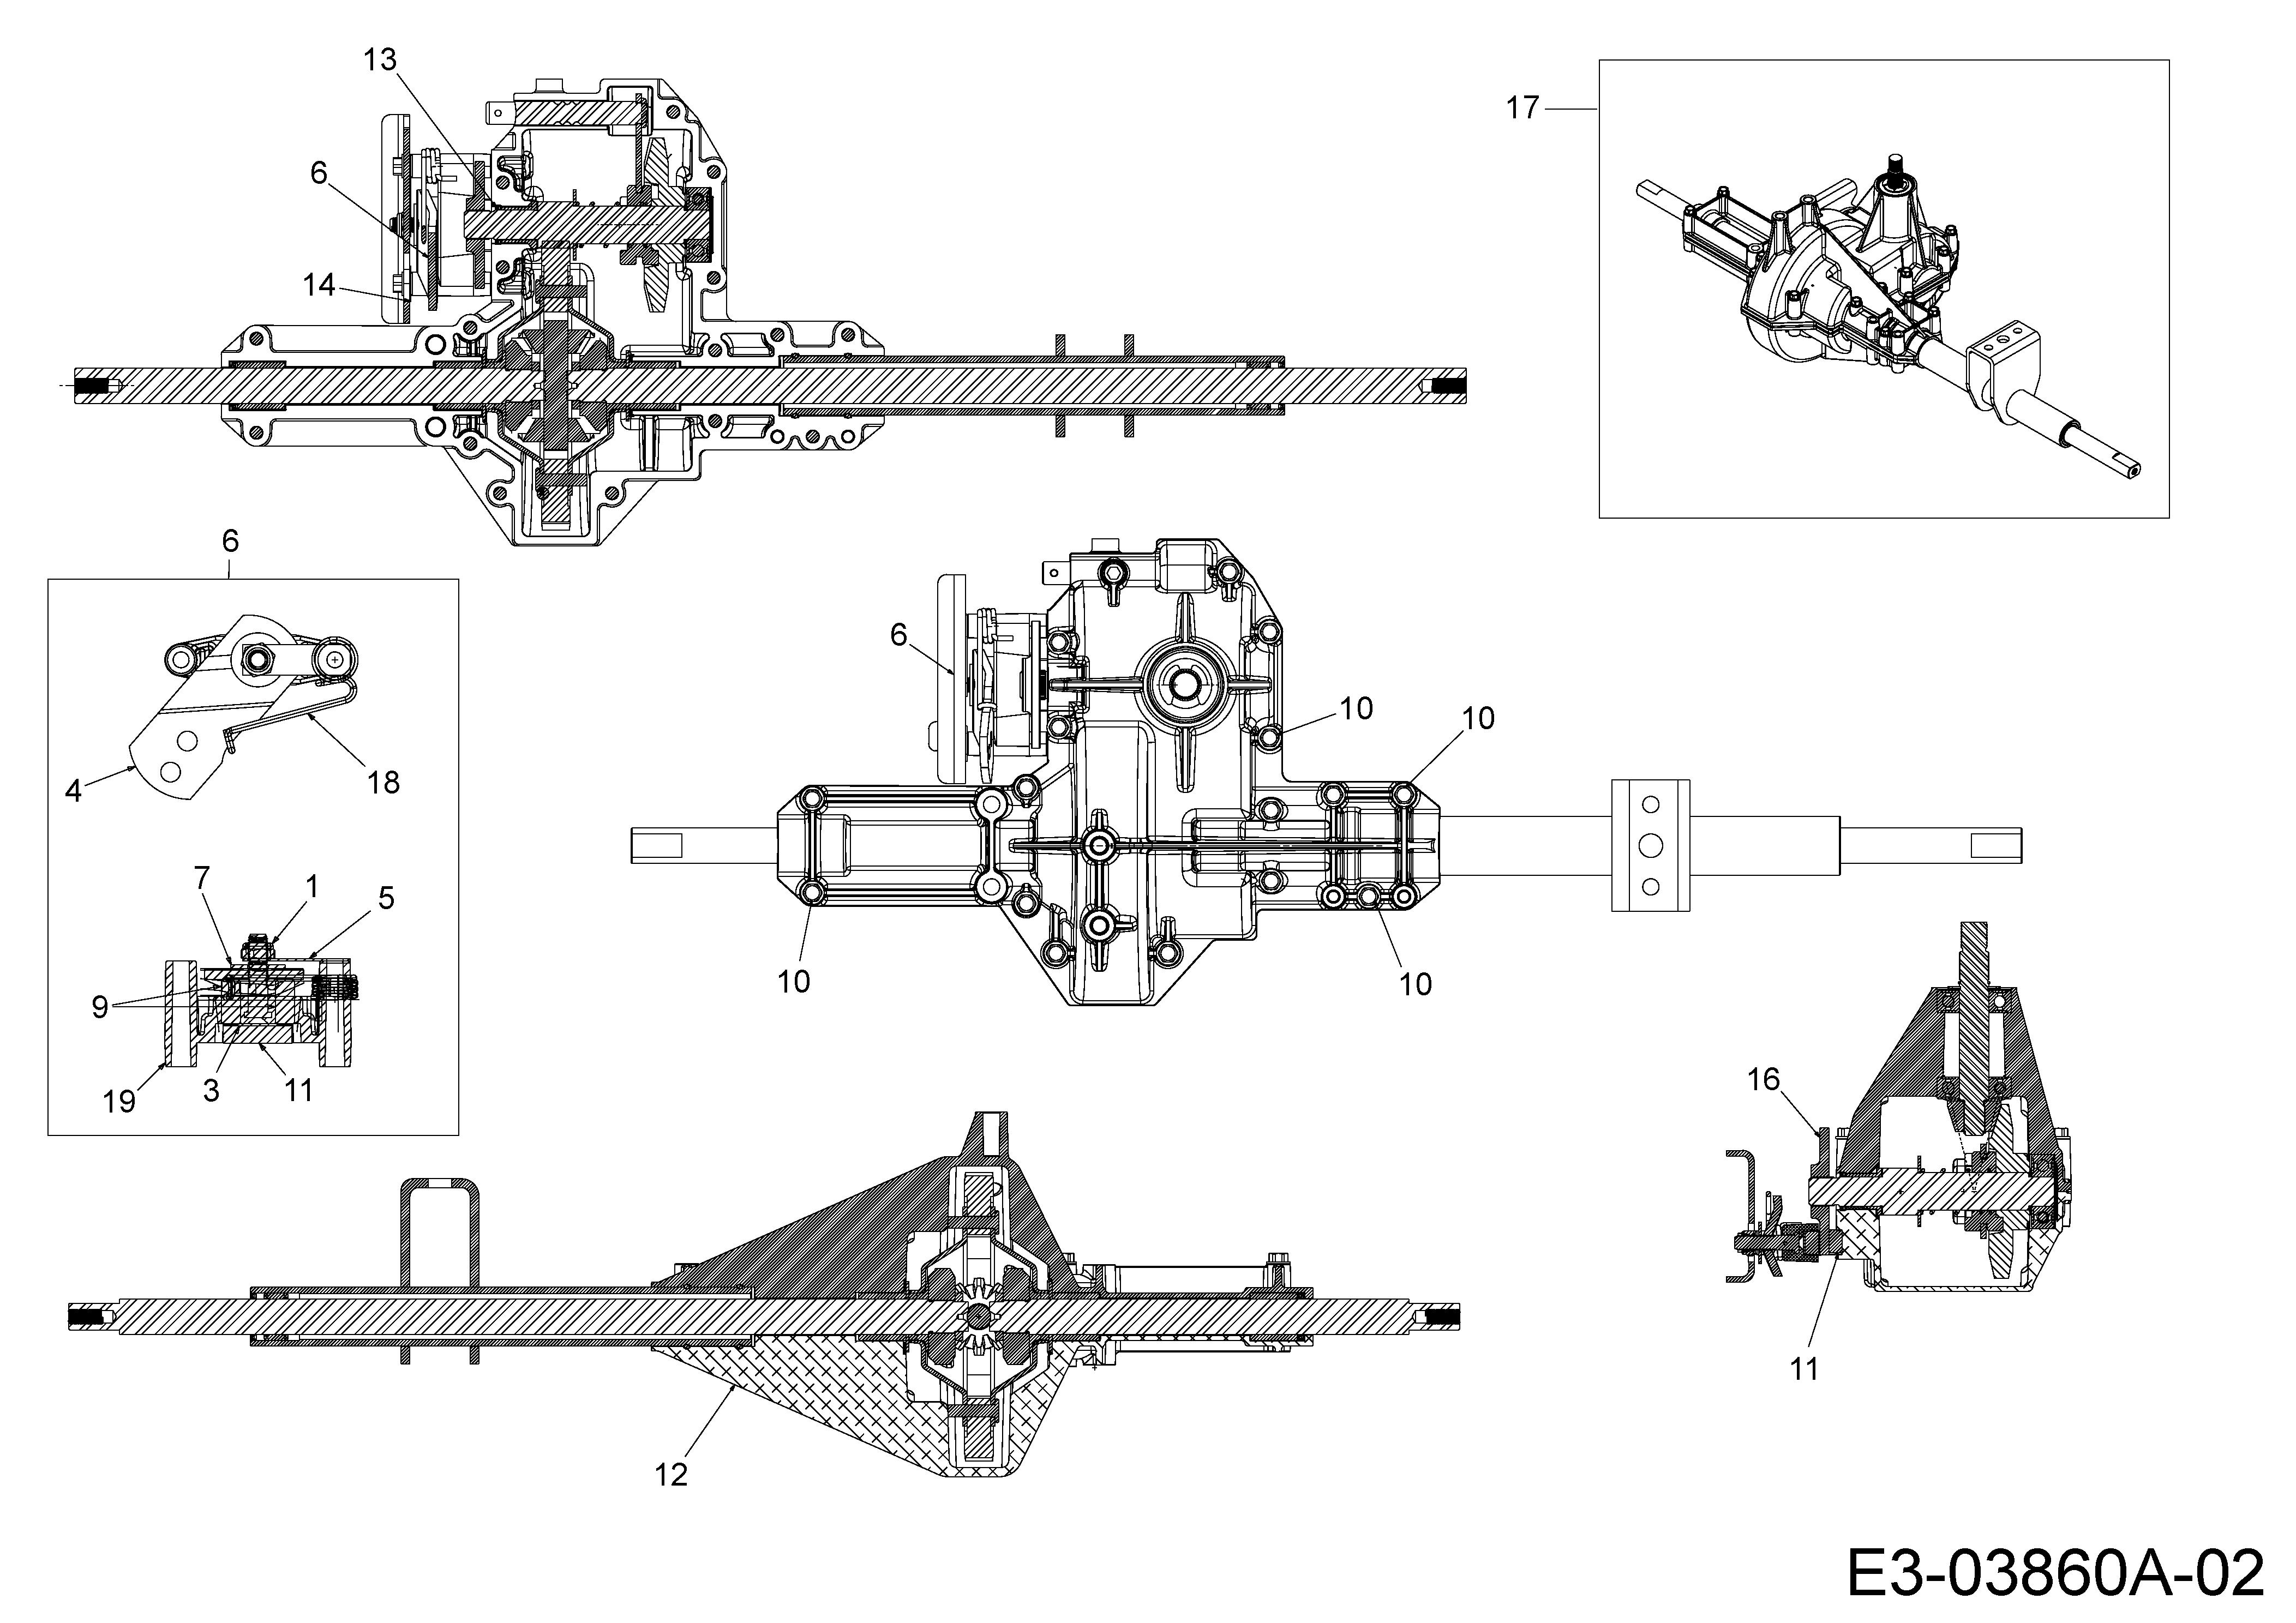 2x Stützrad Deckrad passend Sunline RTH 155//105 13AM783N685 Rasentraktor